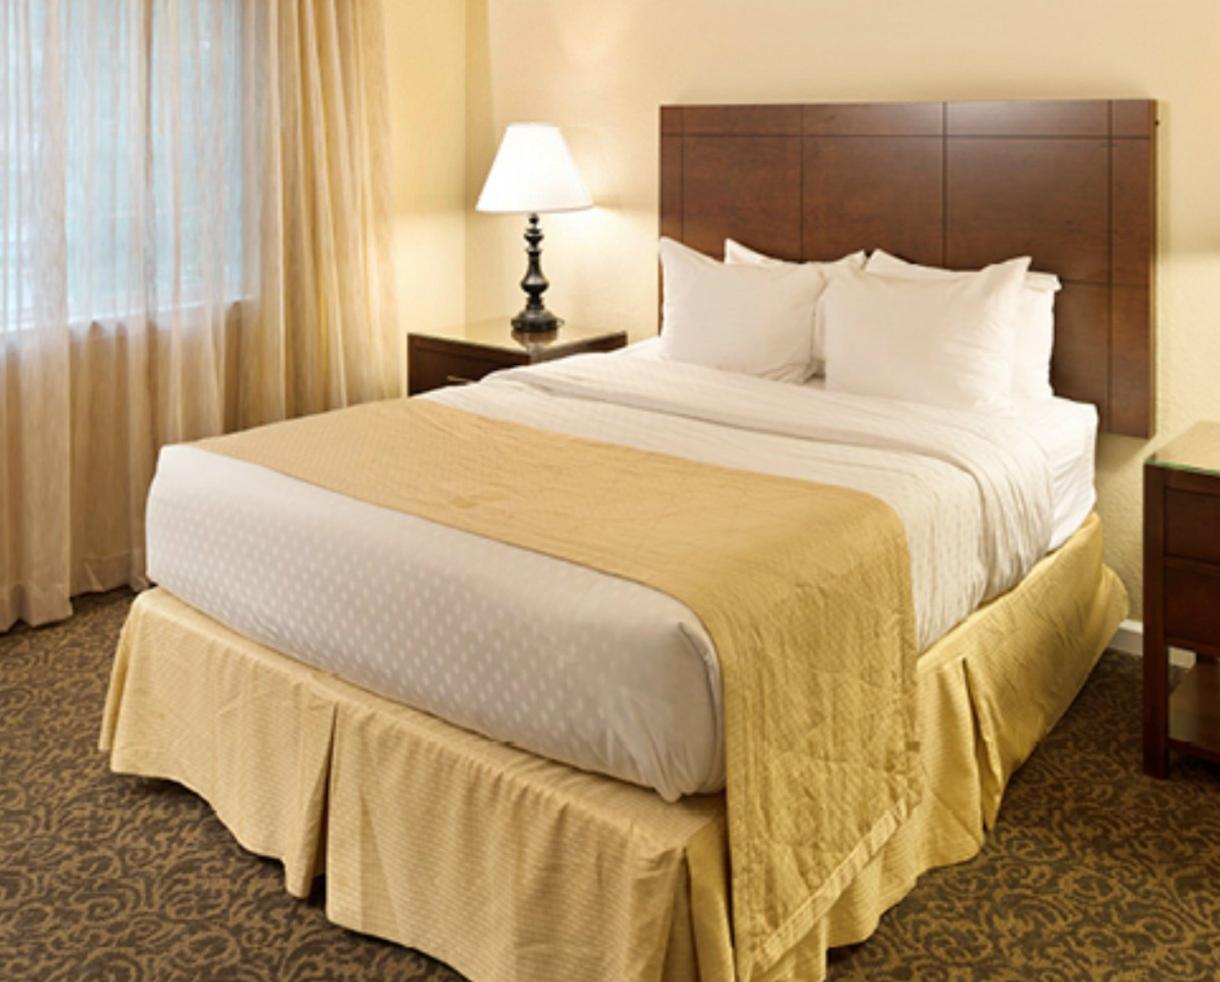 3-Night Getaway in One bedroom condo at The Historic Powhatan Resort